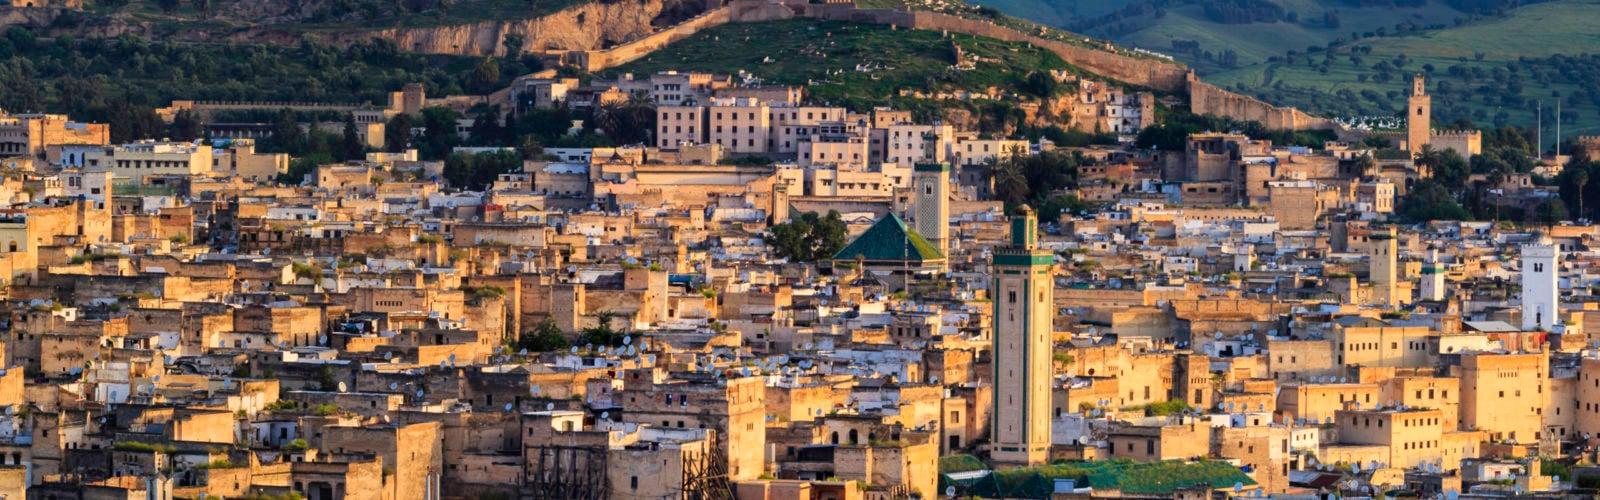 fes-morocco-skyline